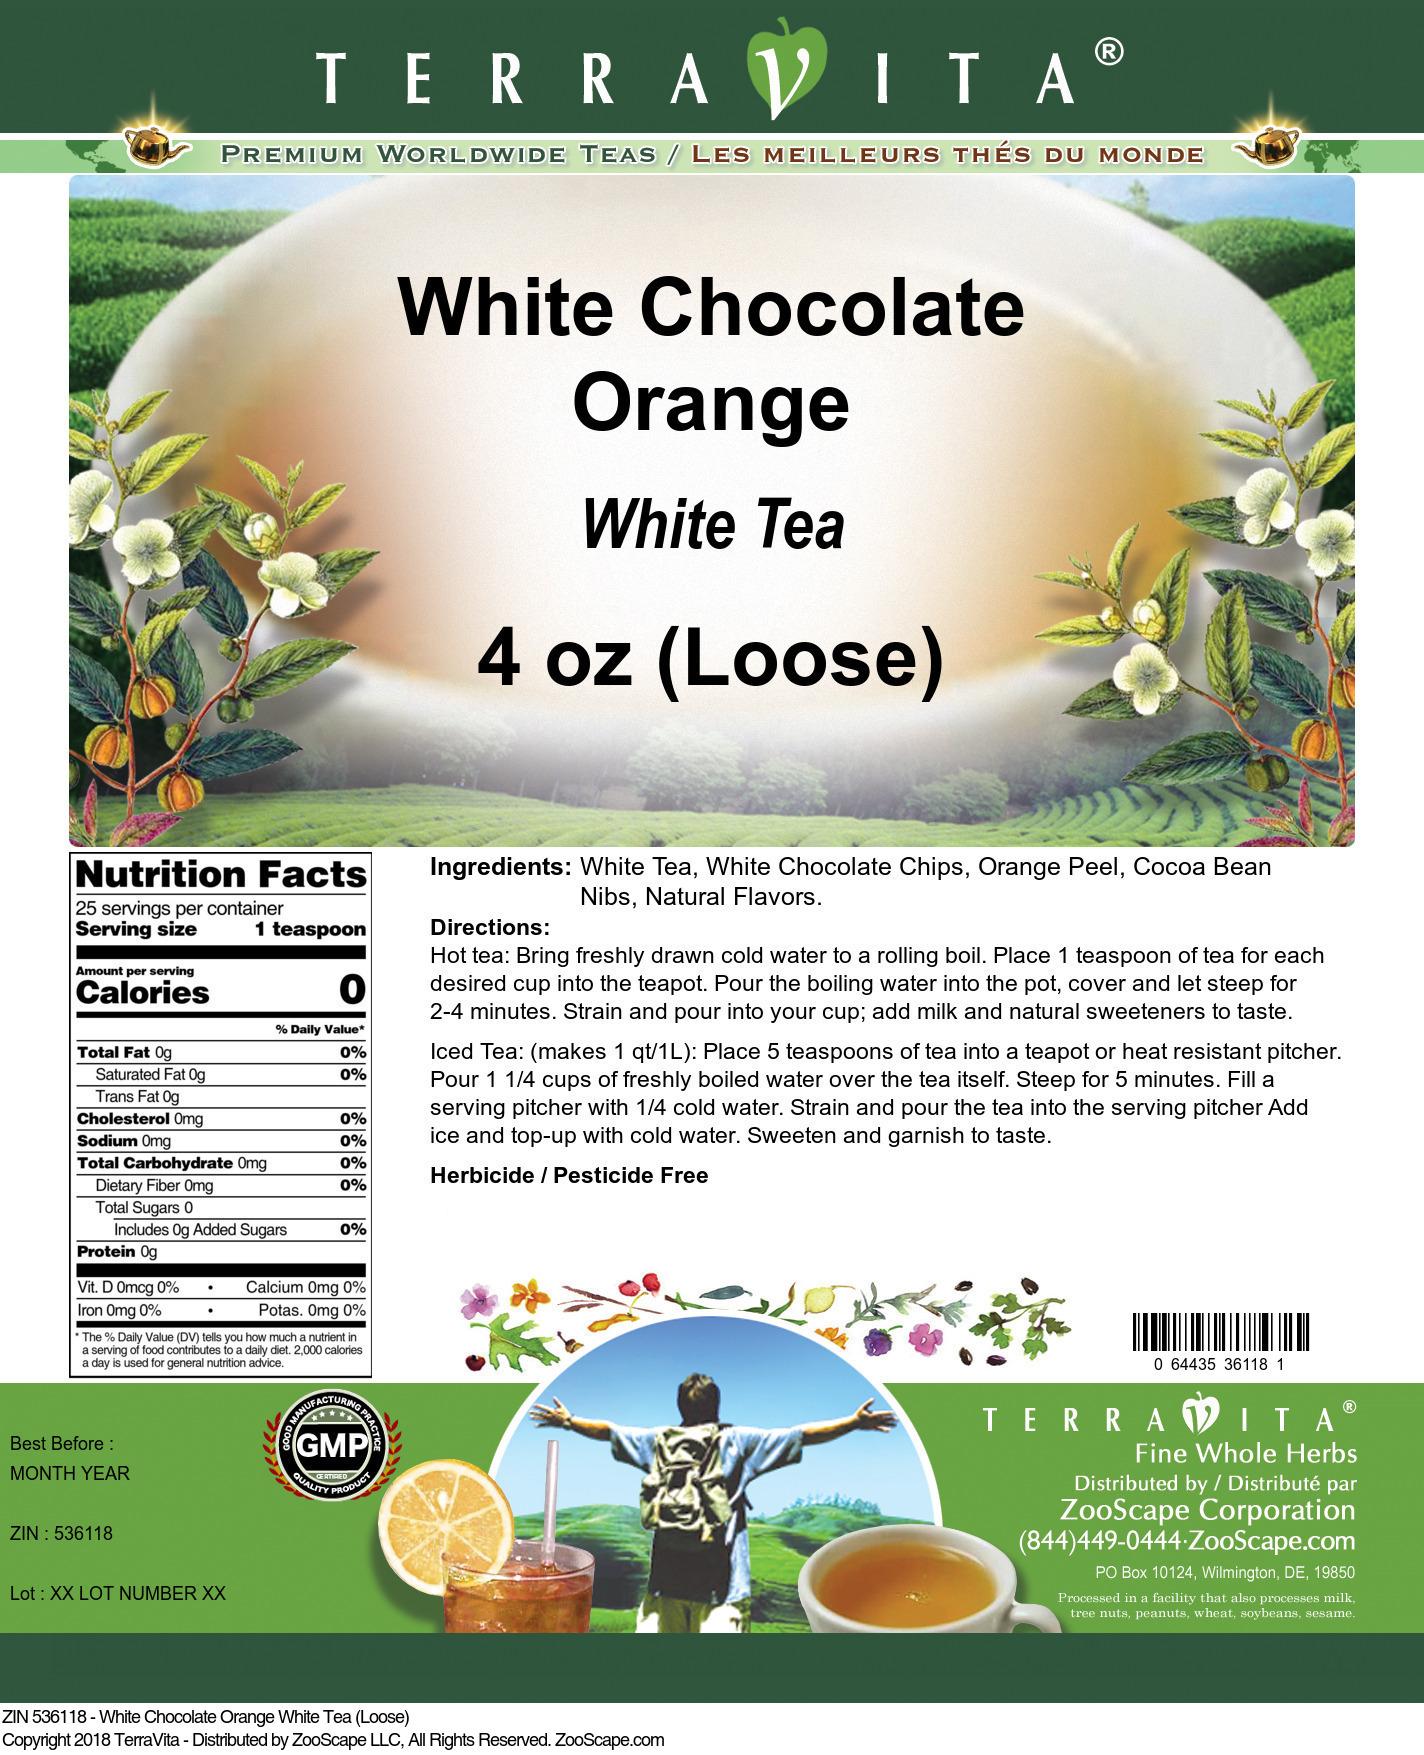 White Chocolate Orange White Tea (Loose)